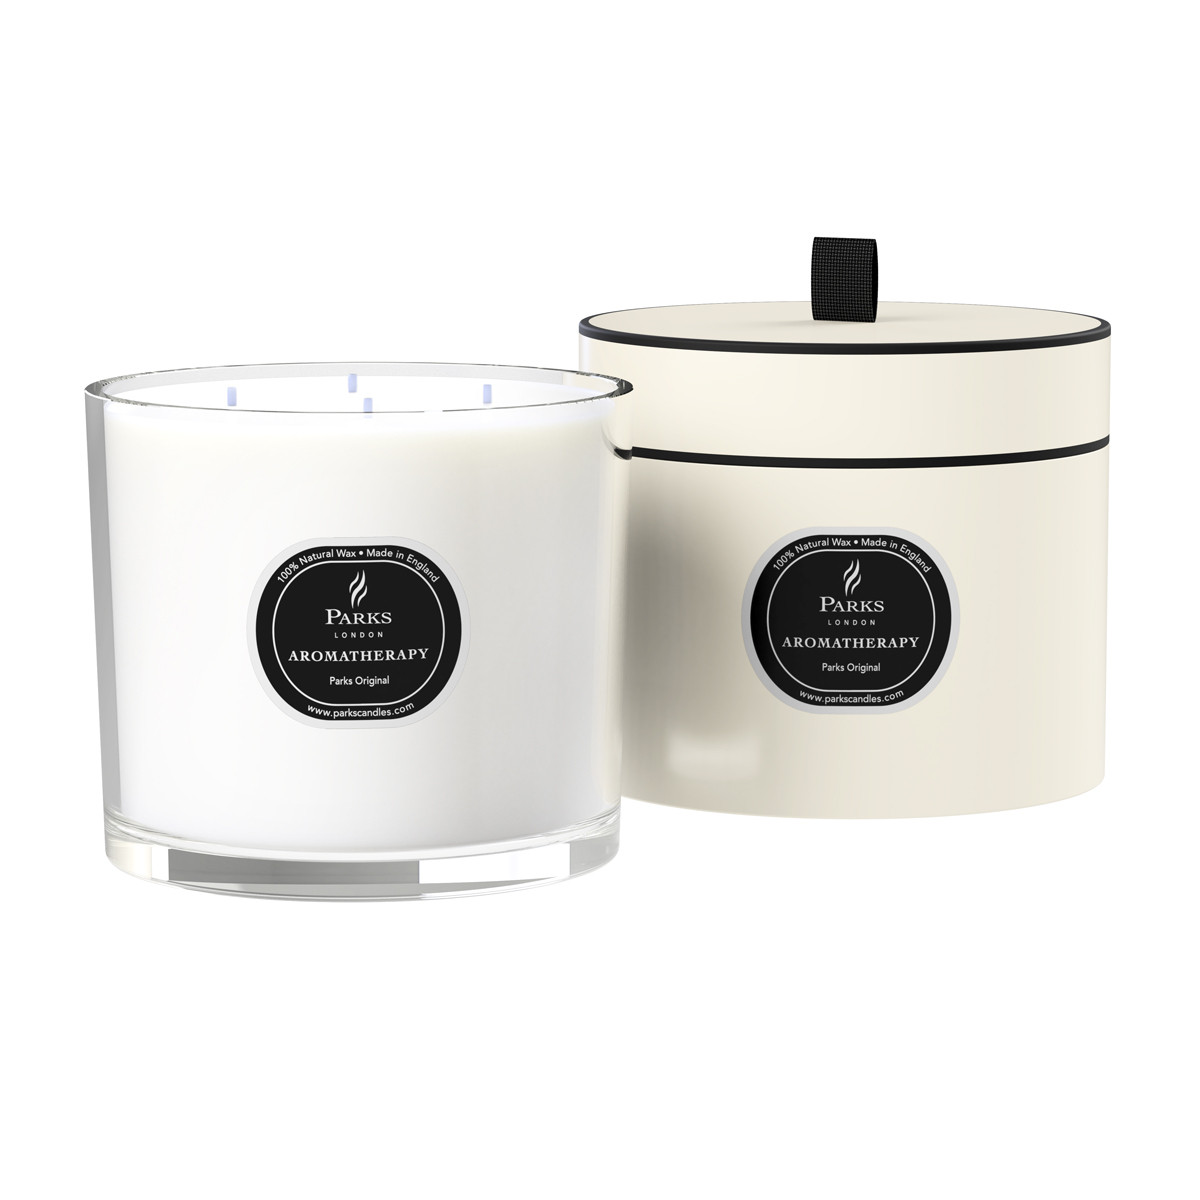 Duftkerzenparks Original - Vanille, Patchouli & Lavendel